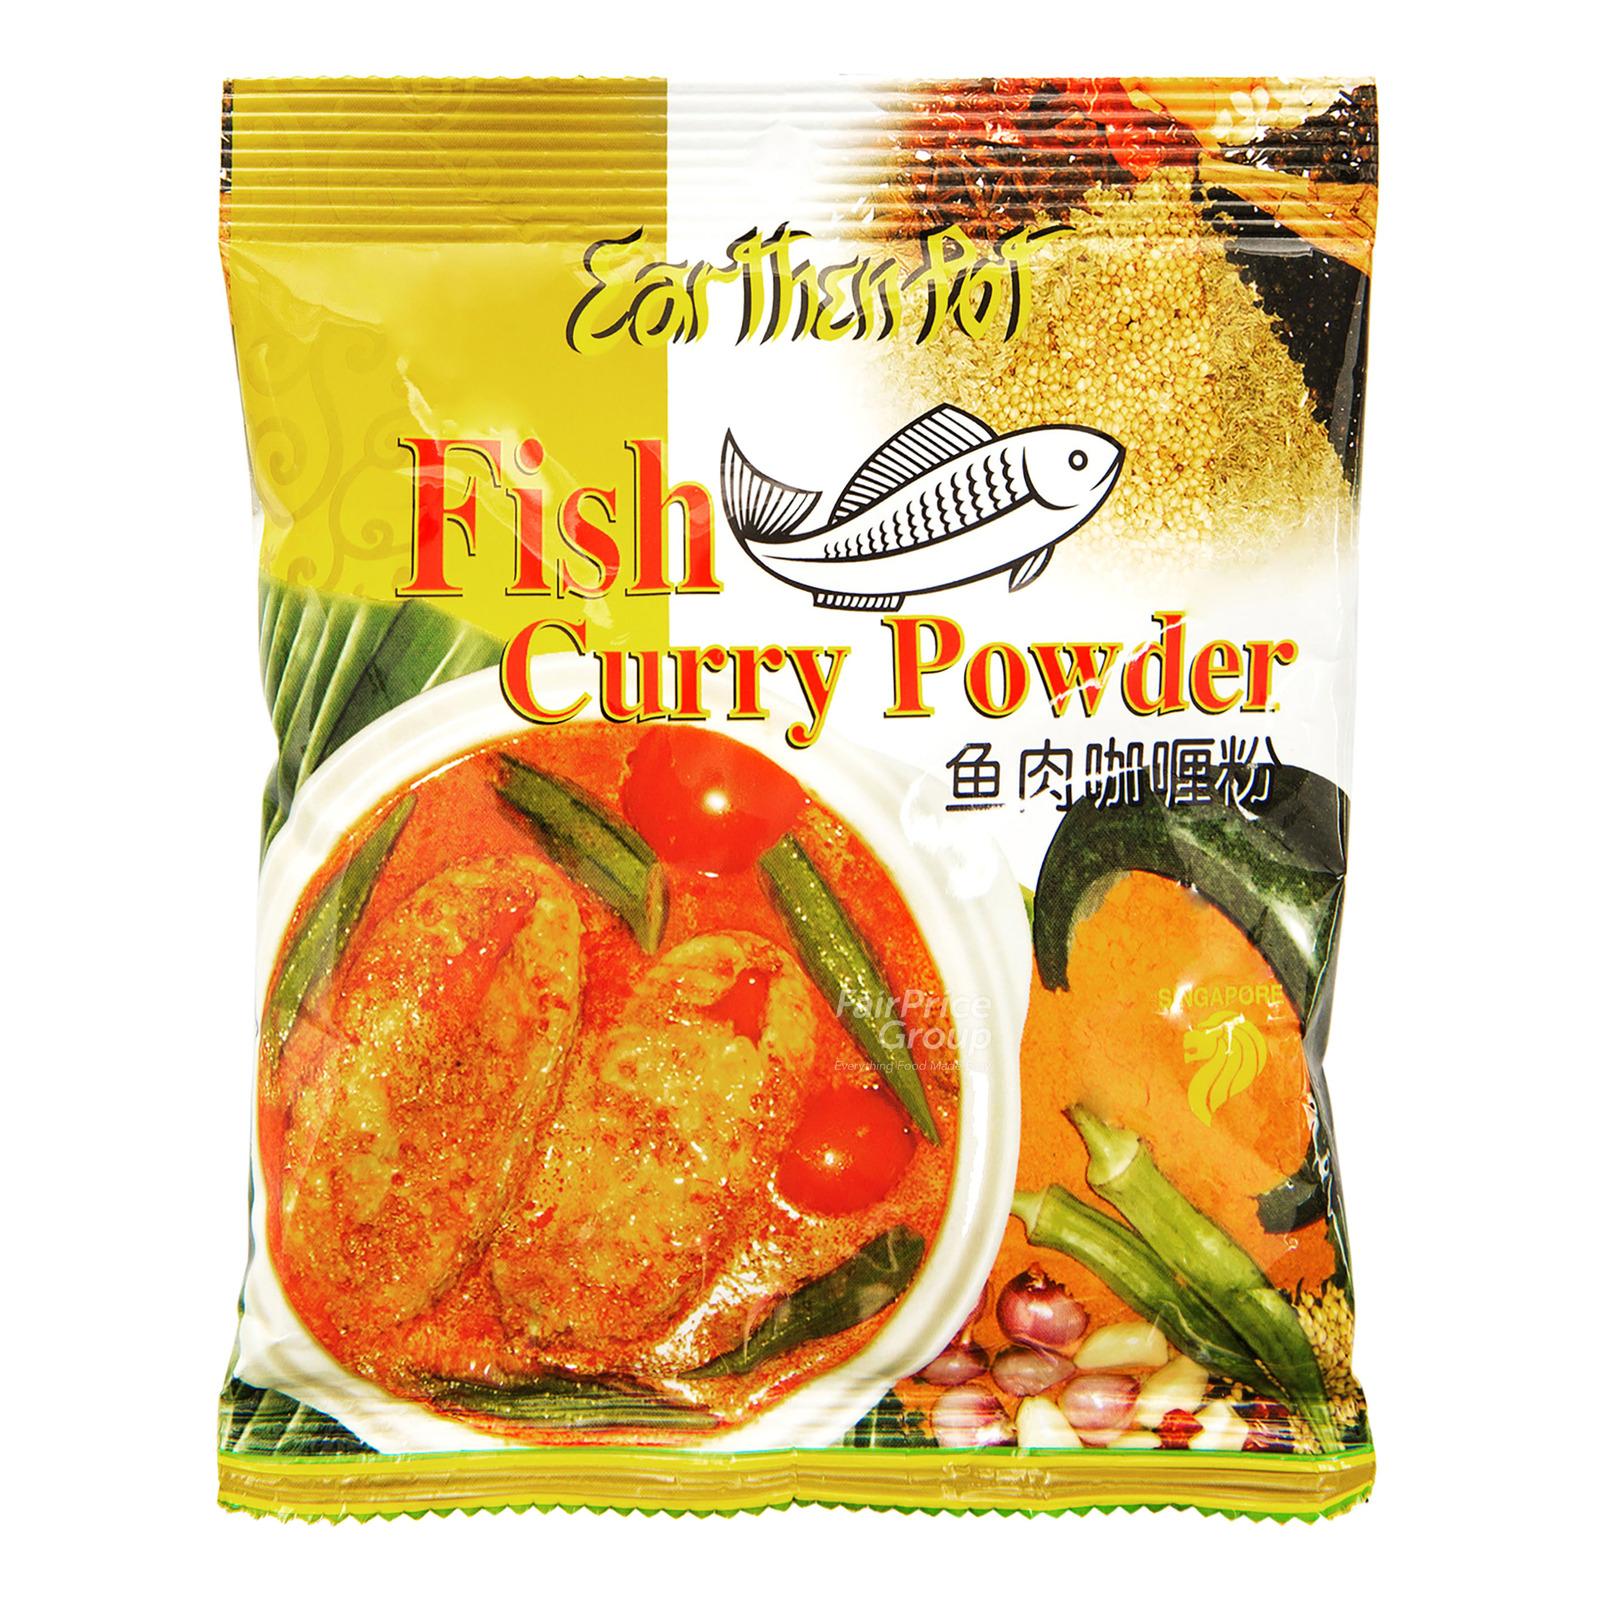 Earthenpot Curry Powder - Fish